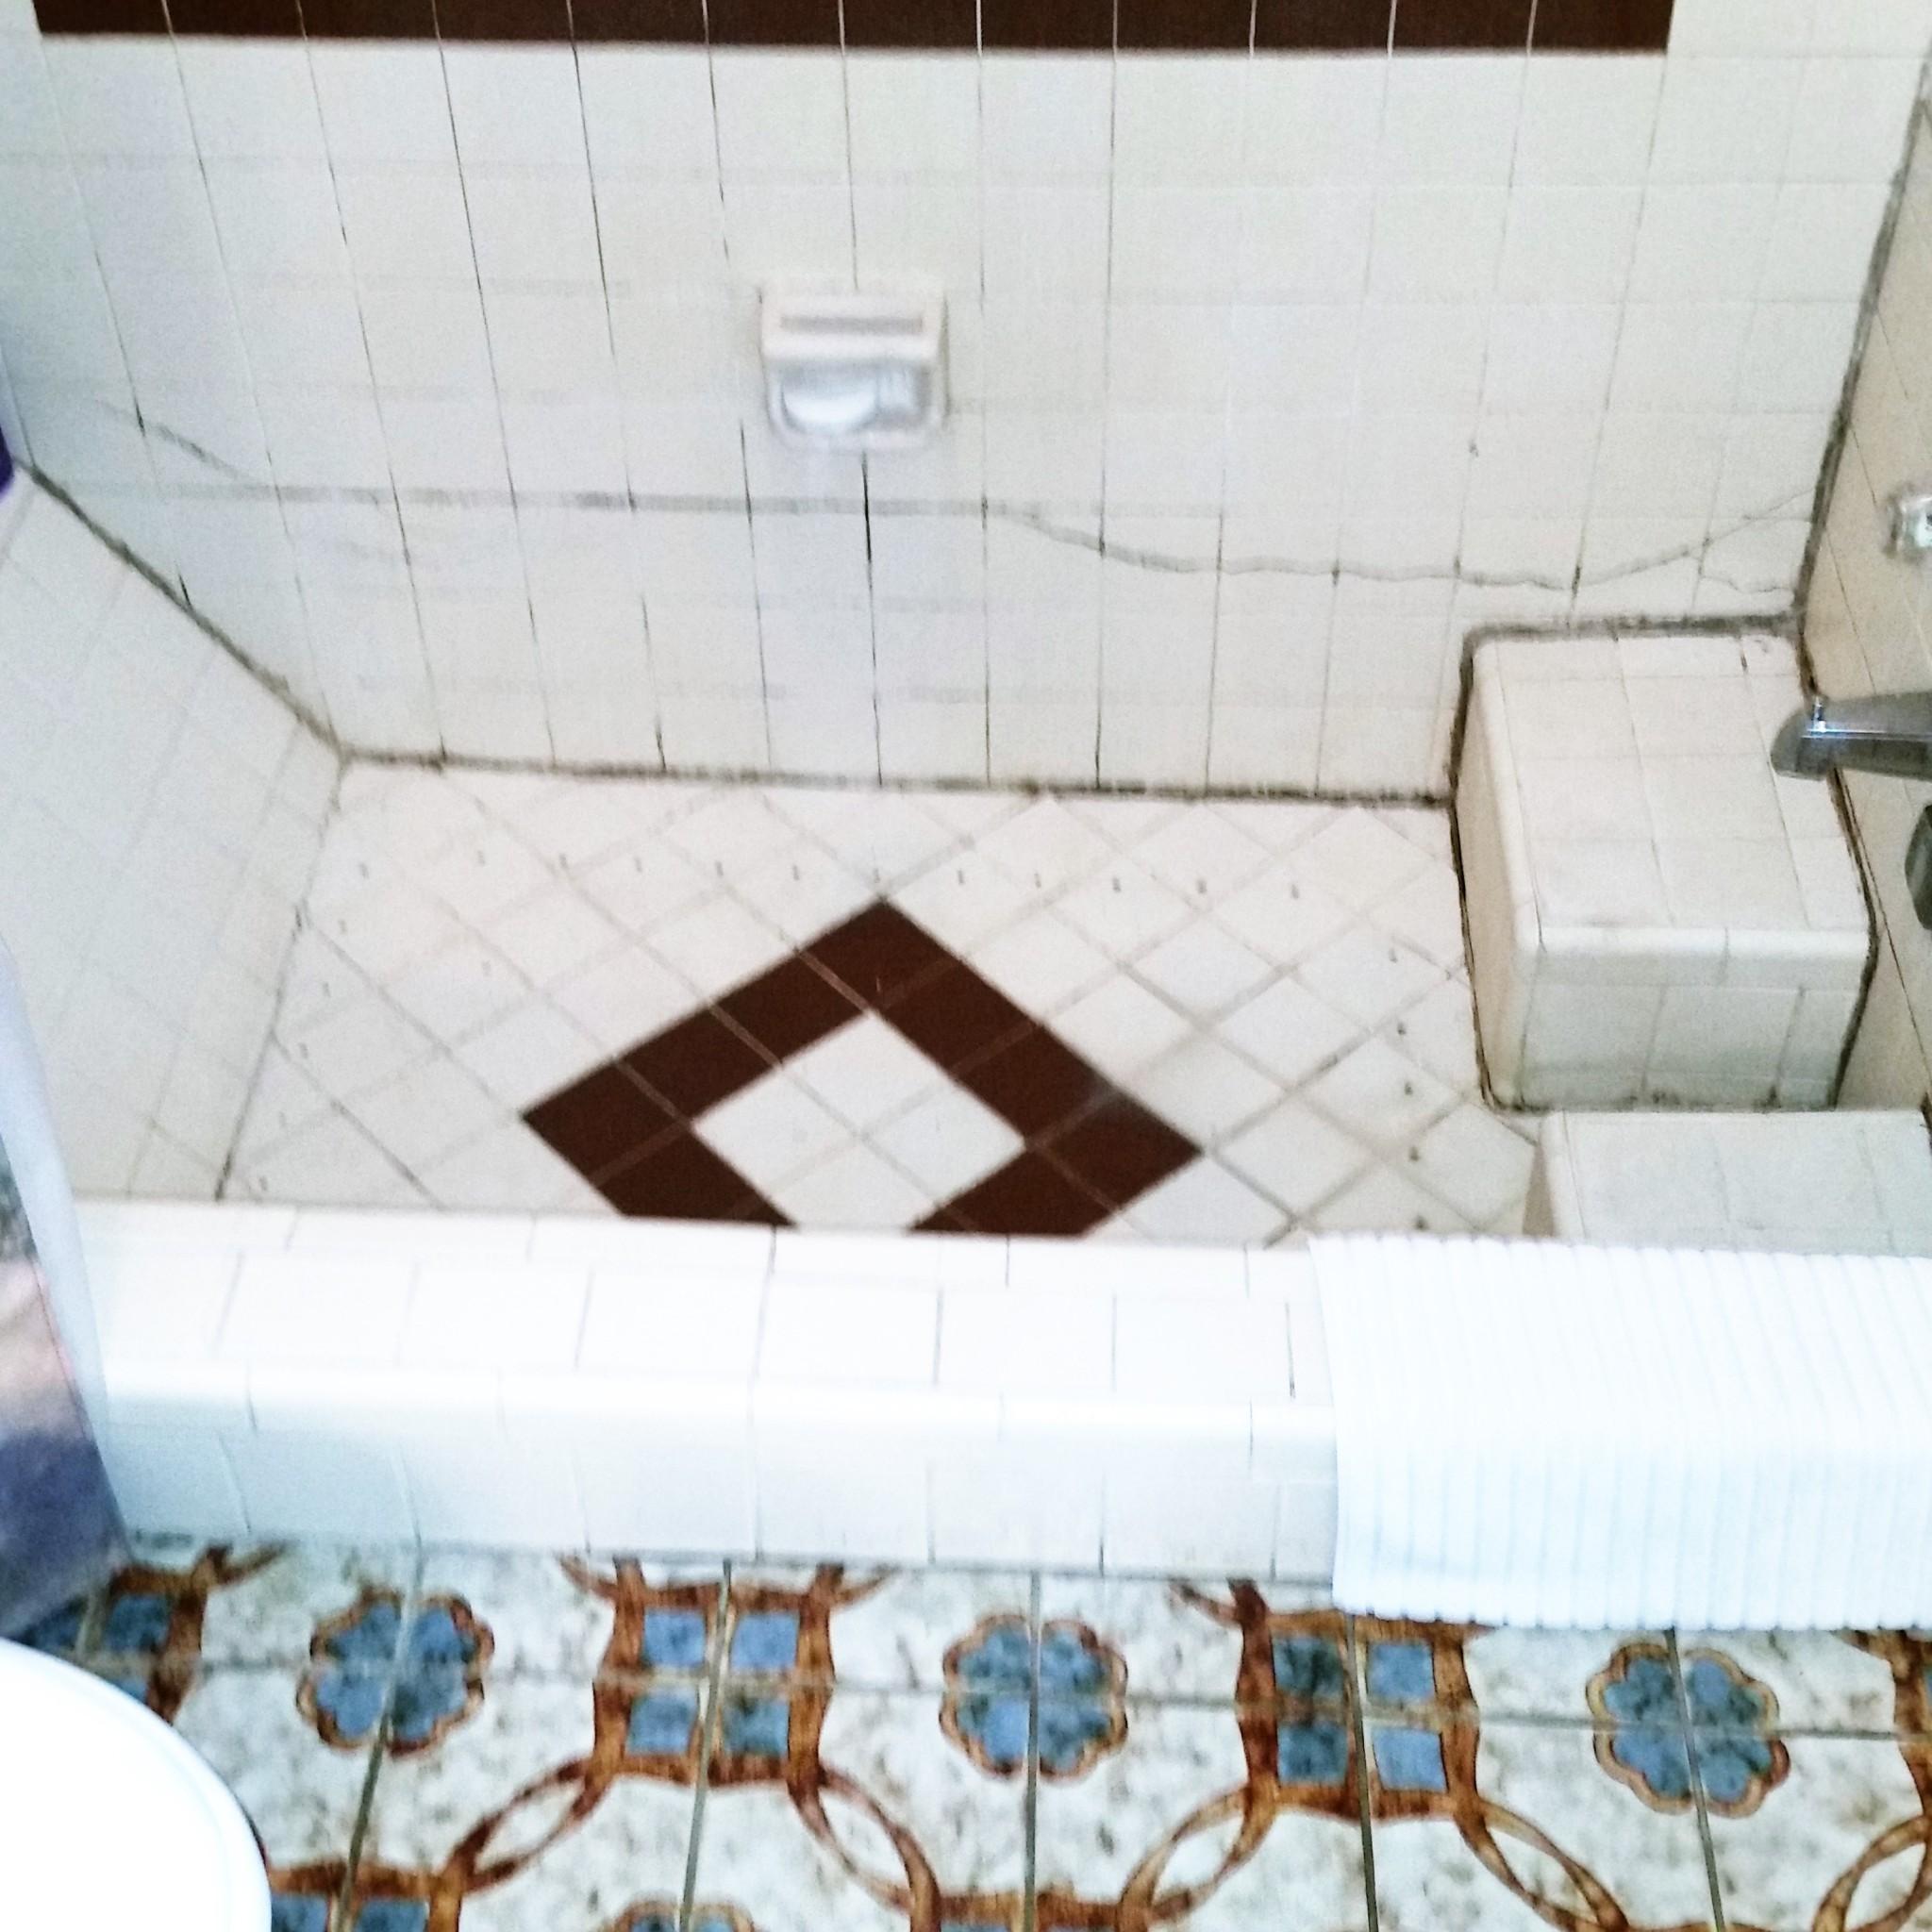 Tampa Bay Bathroom Remodeling: 1st Place NARI Tampa Bay 2016 CotY Bath Remodel Under $25k